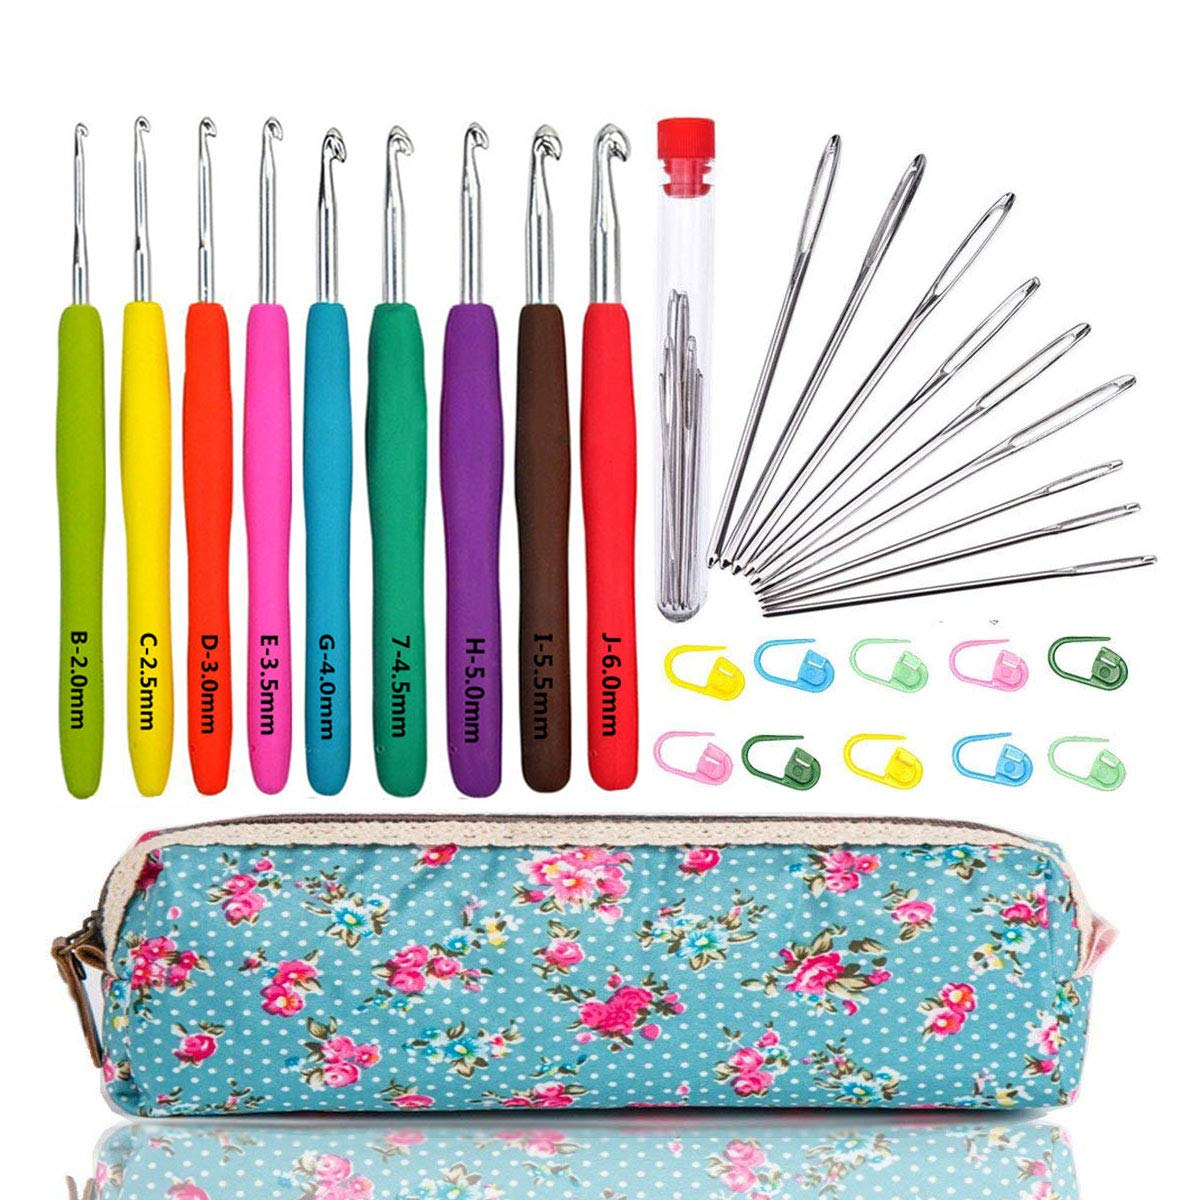 WooCrafts Large-Eye Blunt Needles Yarn Knitting Plus Crochet Hooks Set with Case,Ergonomic Handle Crochet Hooks Needles for Arthritic Hands.Best Gift!